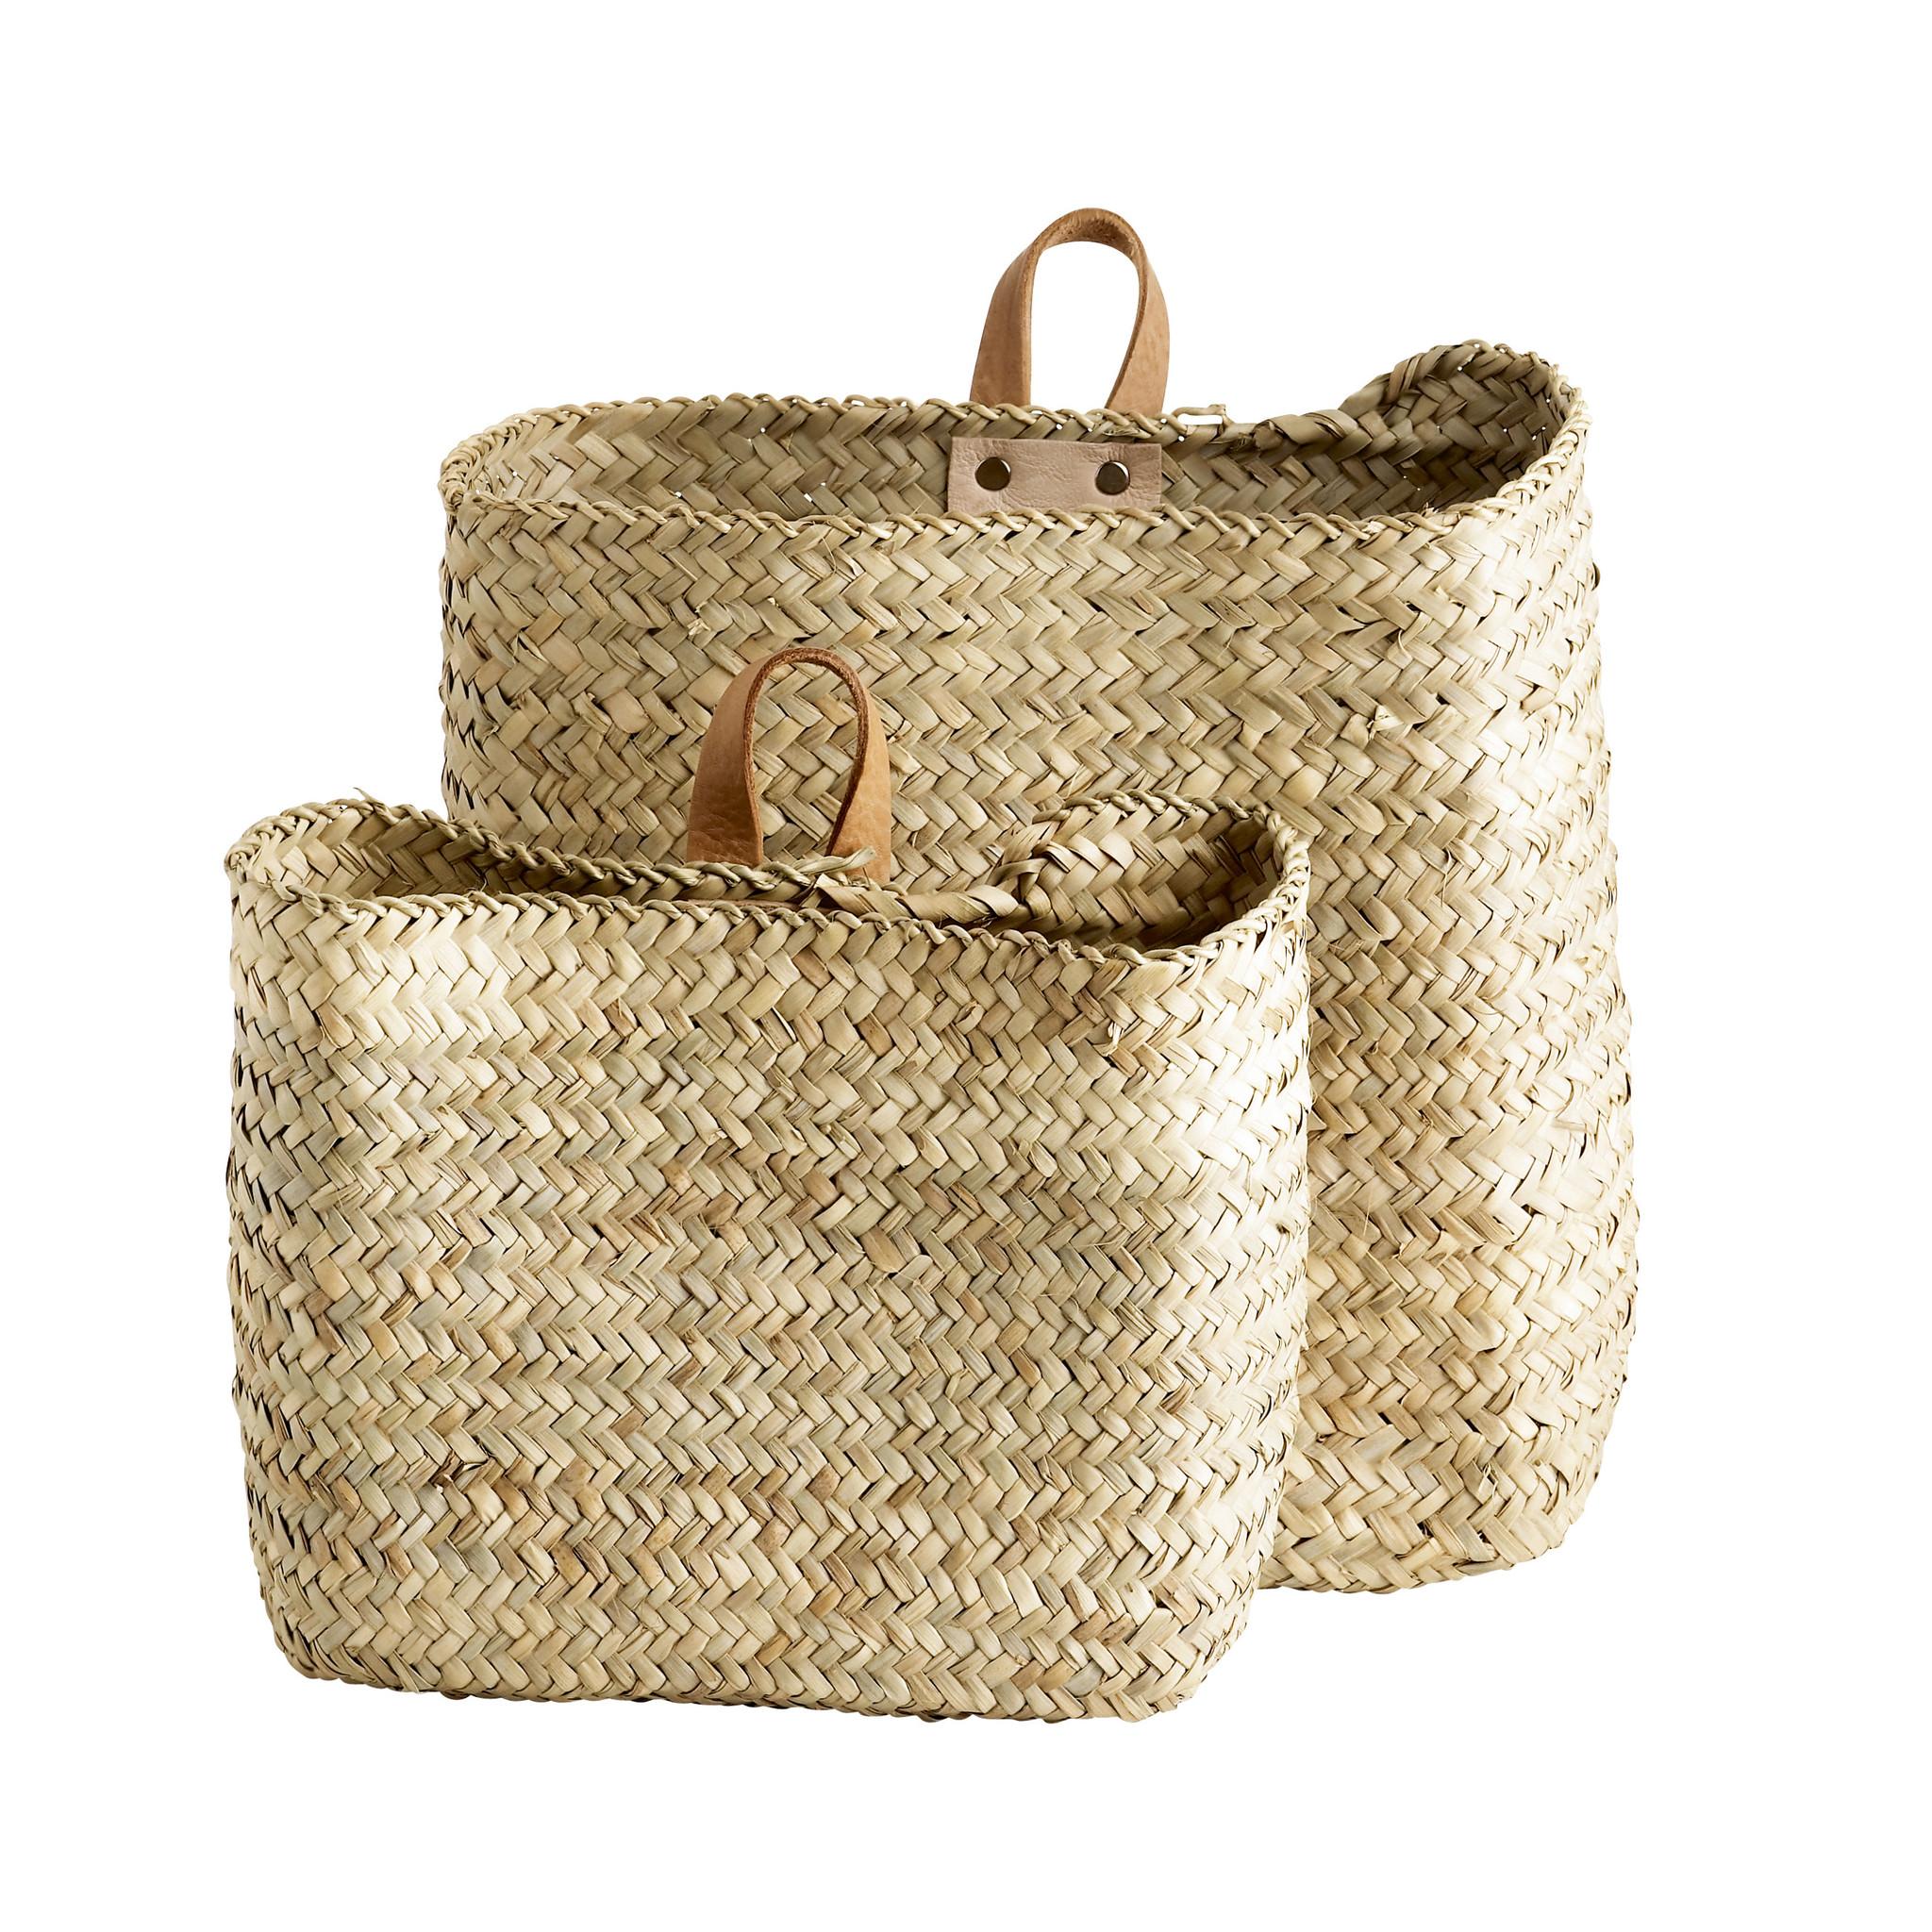 TineKHome Set of 2 Natural wall baskets - natural - 43xh35cm y 25xh23cm